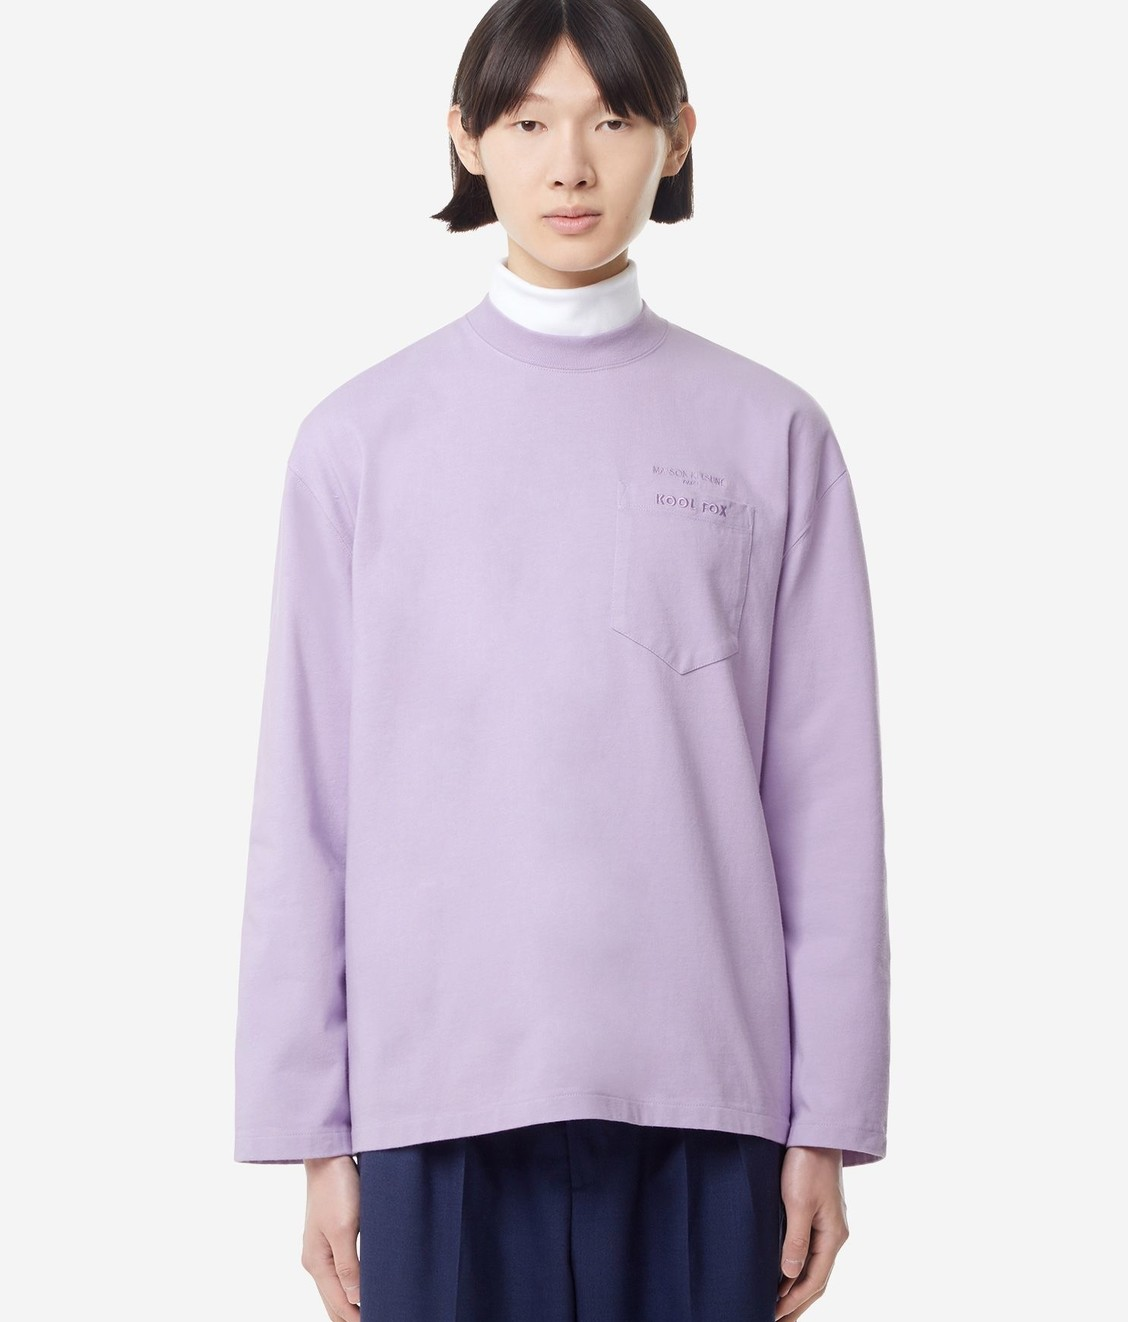 Maison Kitsune Maison Kitsune LS Oversized Shirt Lilac